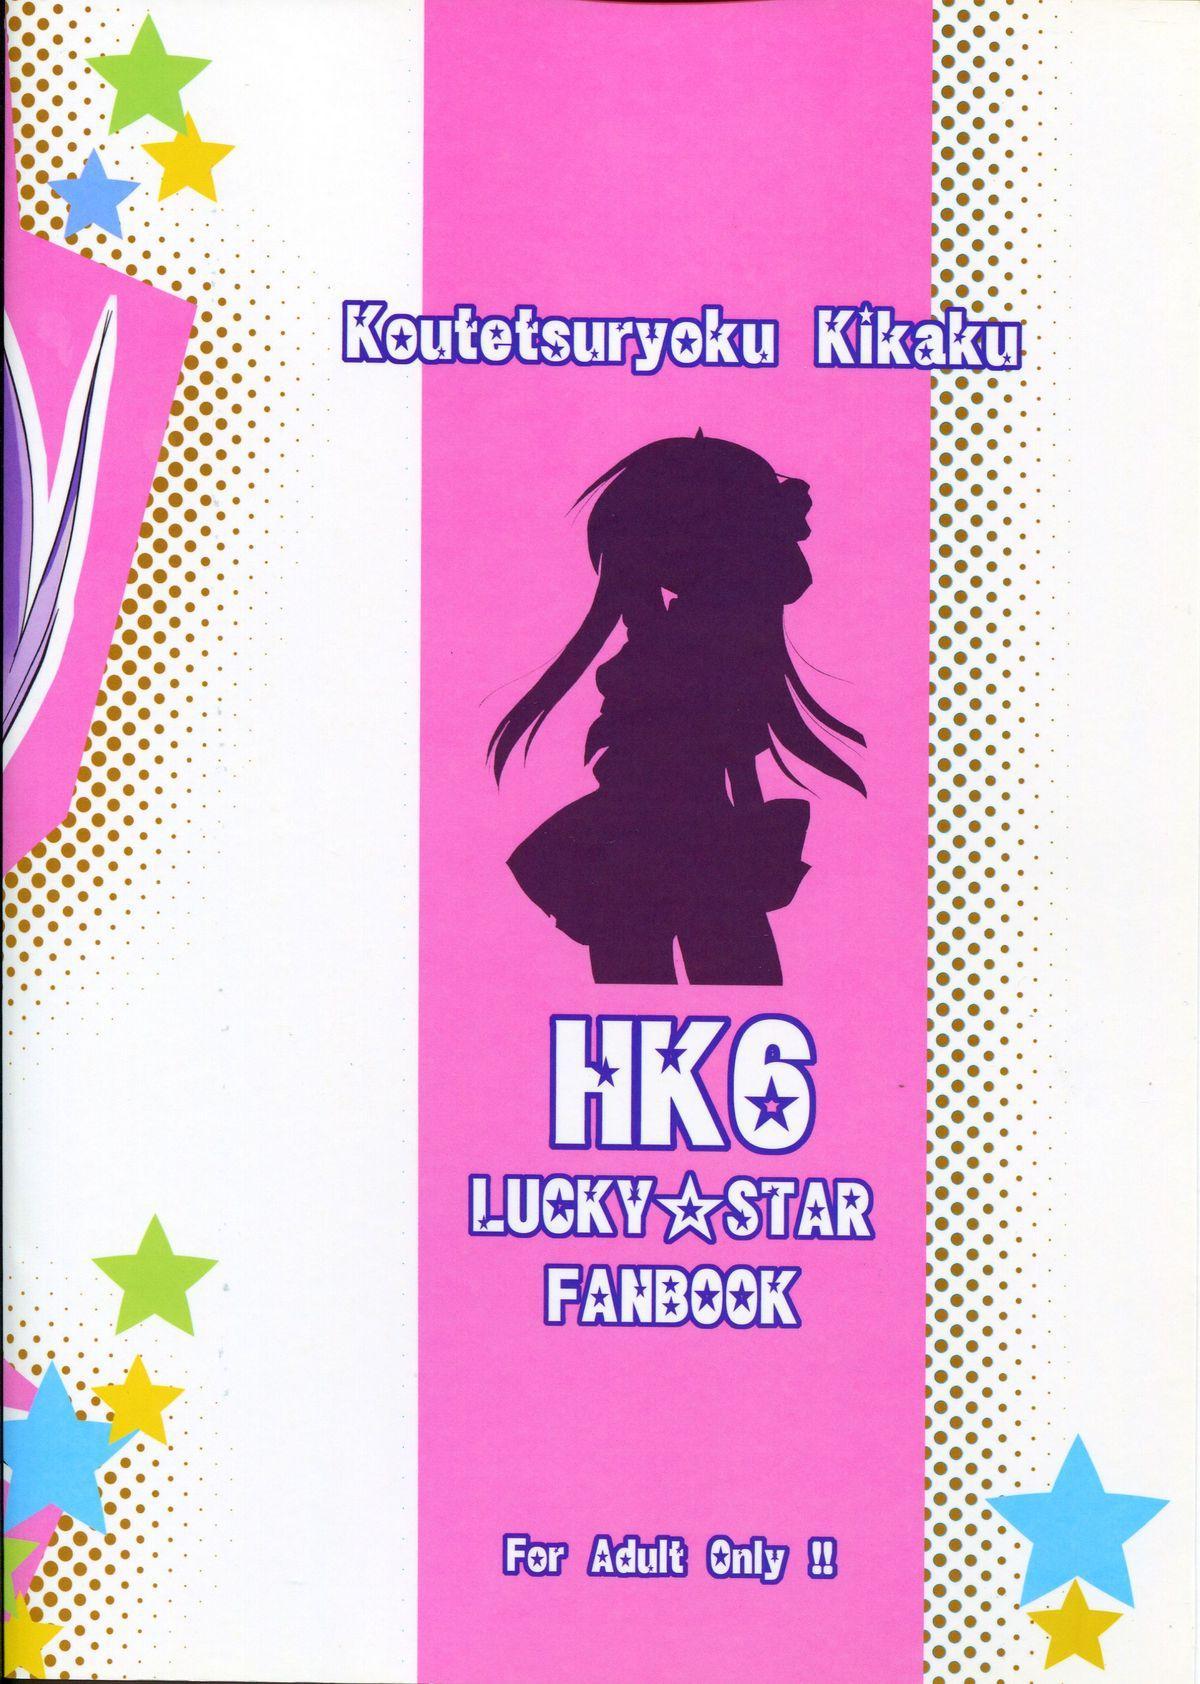 HK6 1